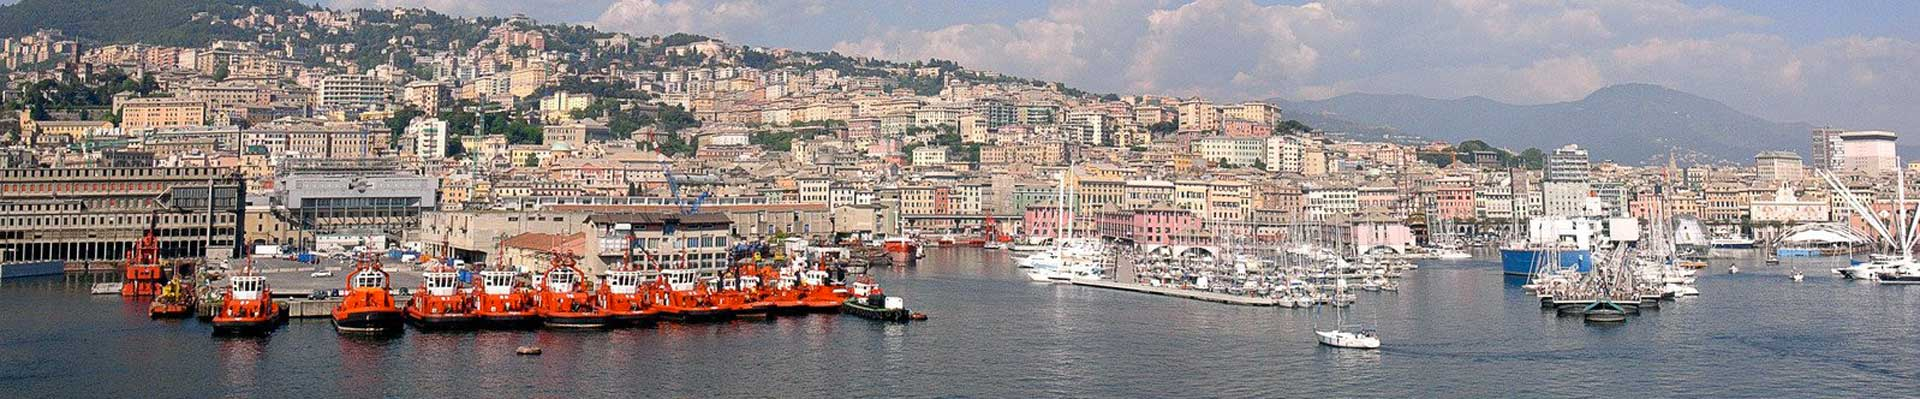 Genova City tour